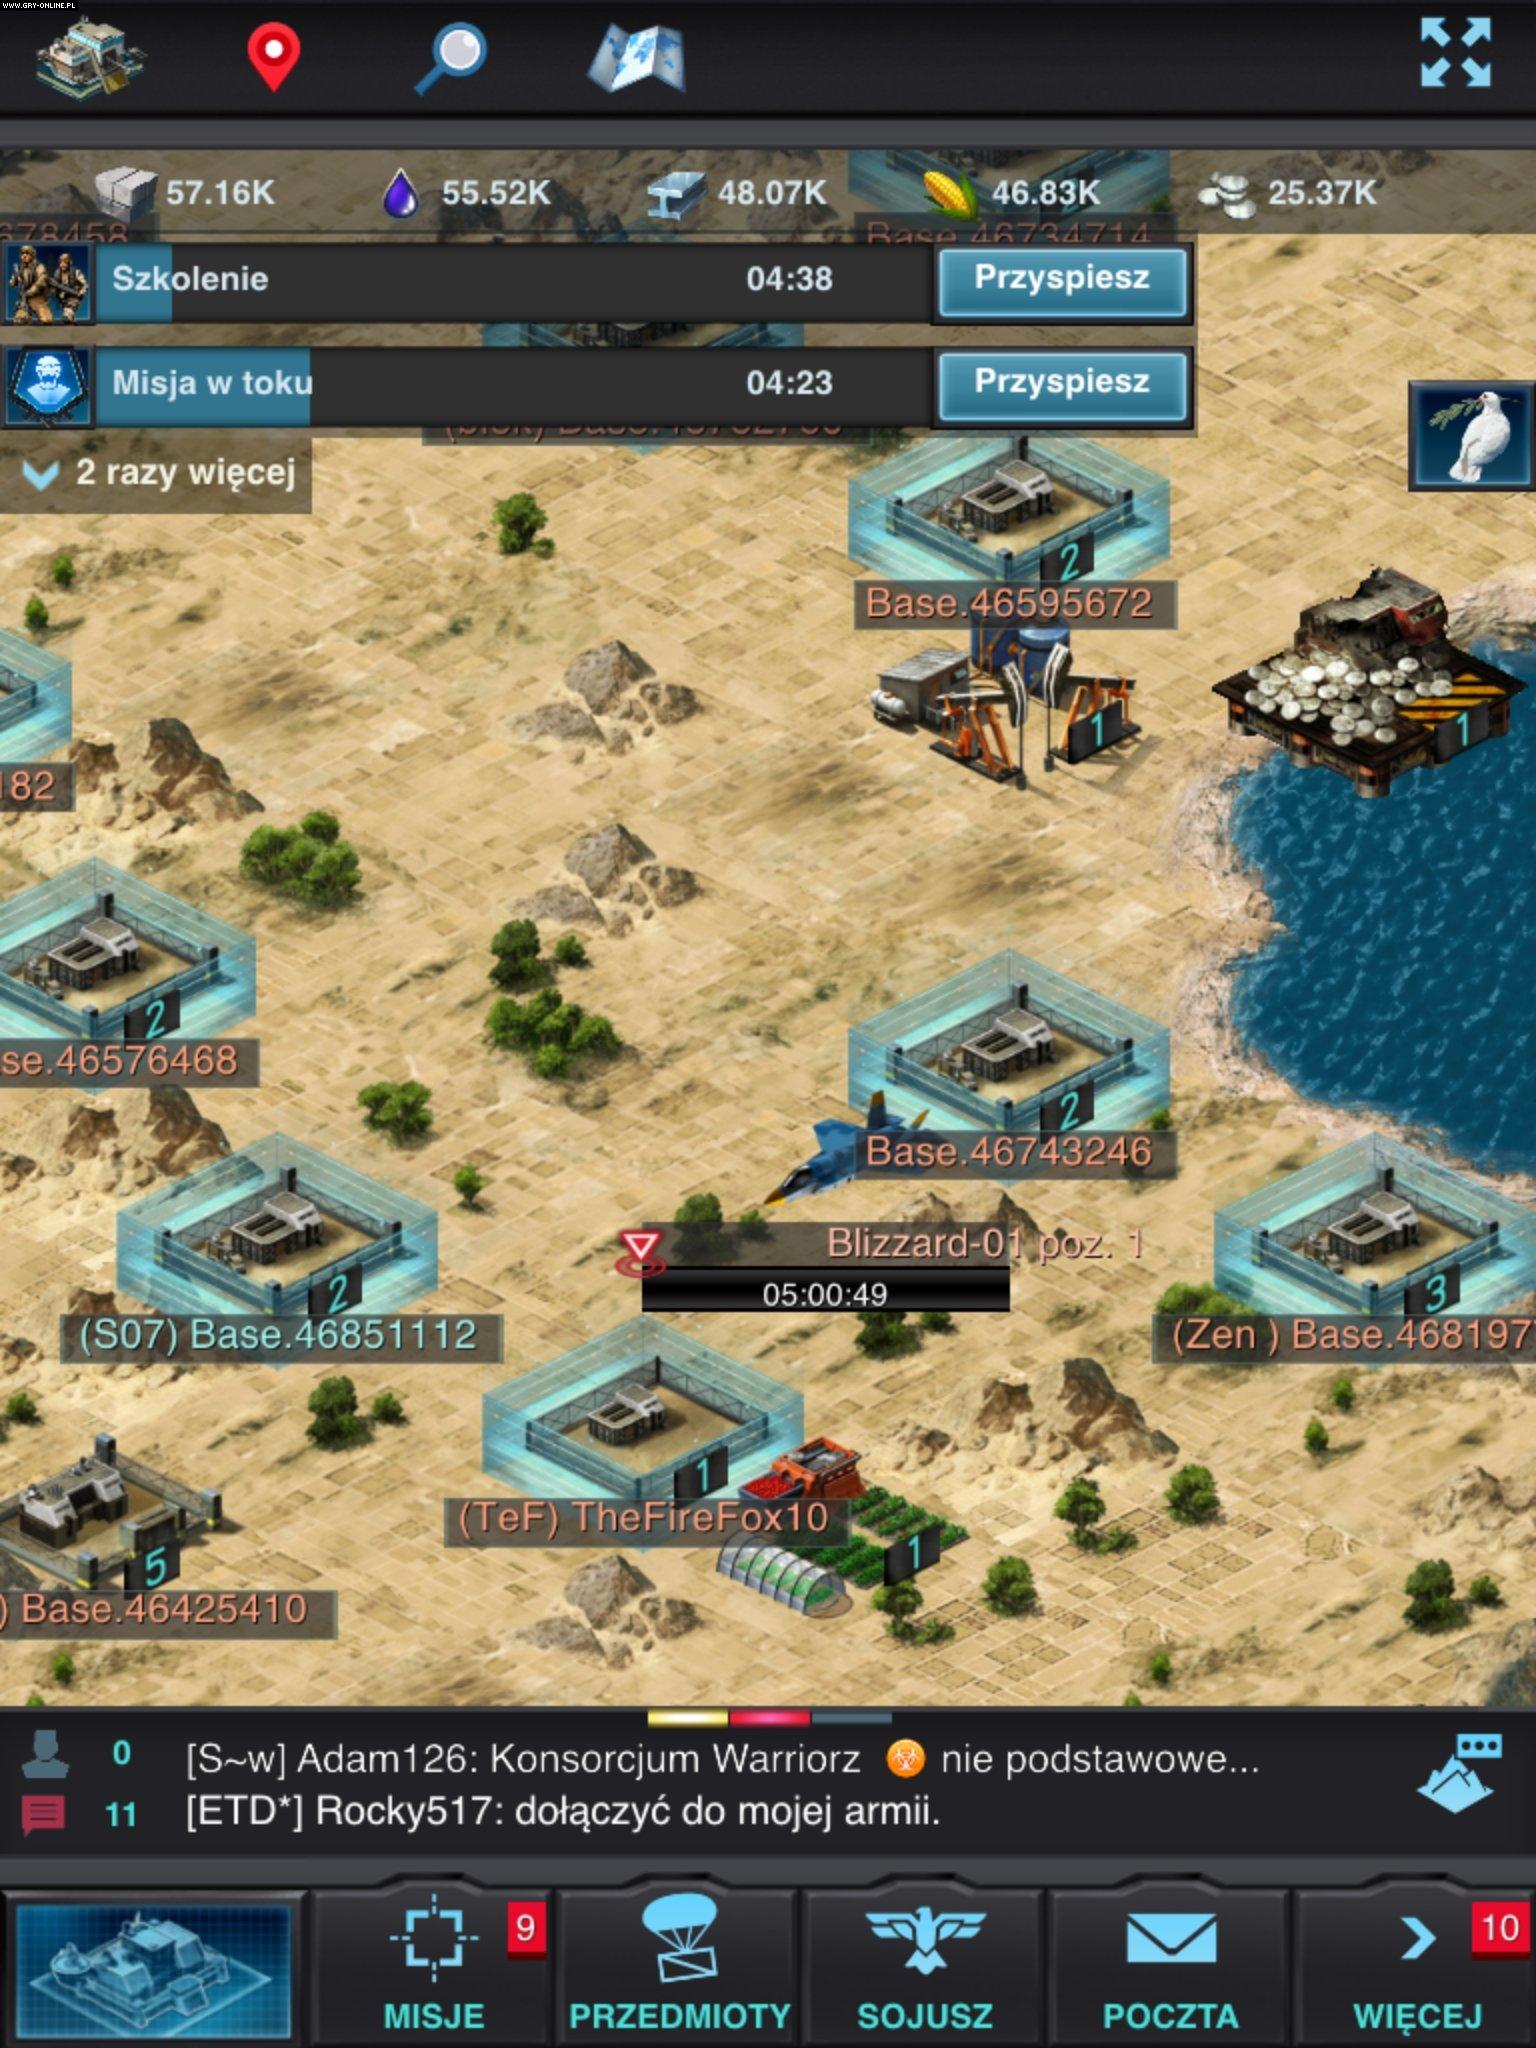 mobile strike machine zone